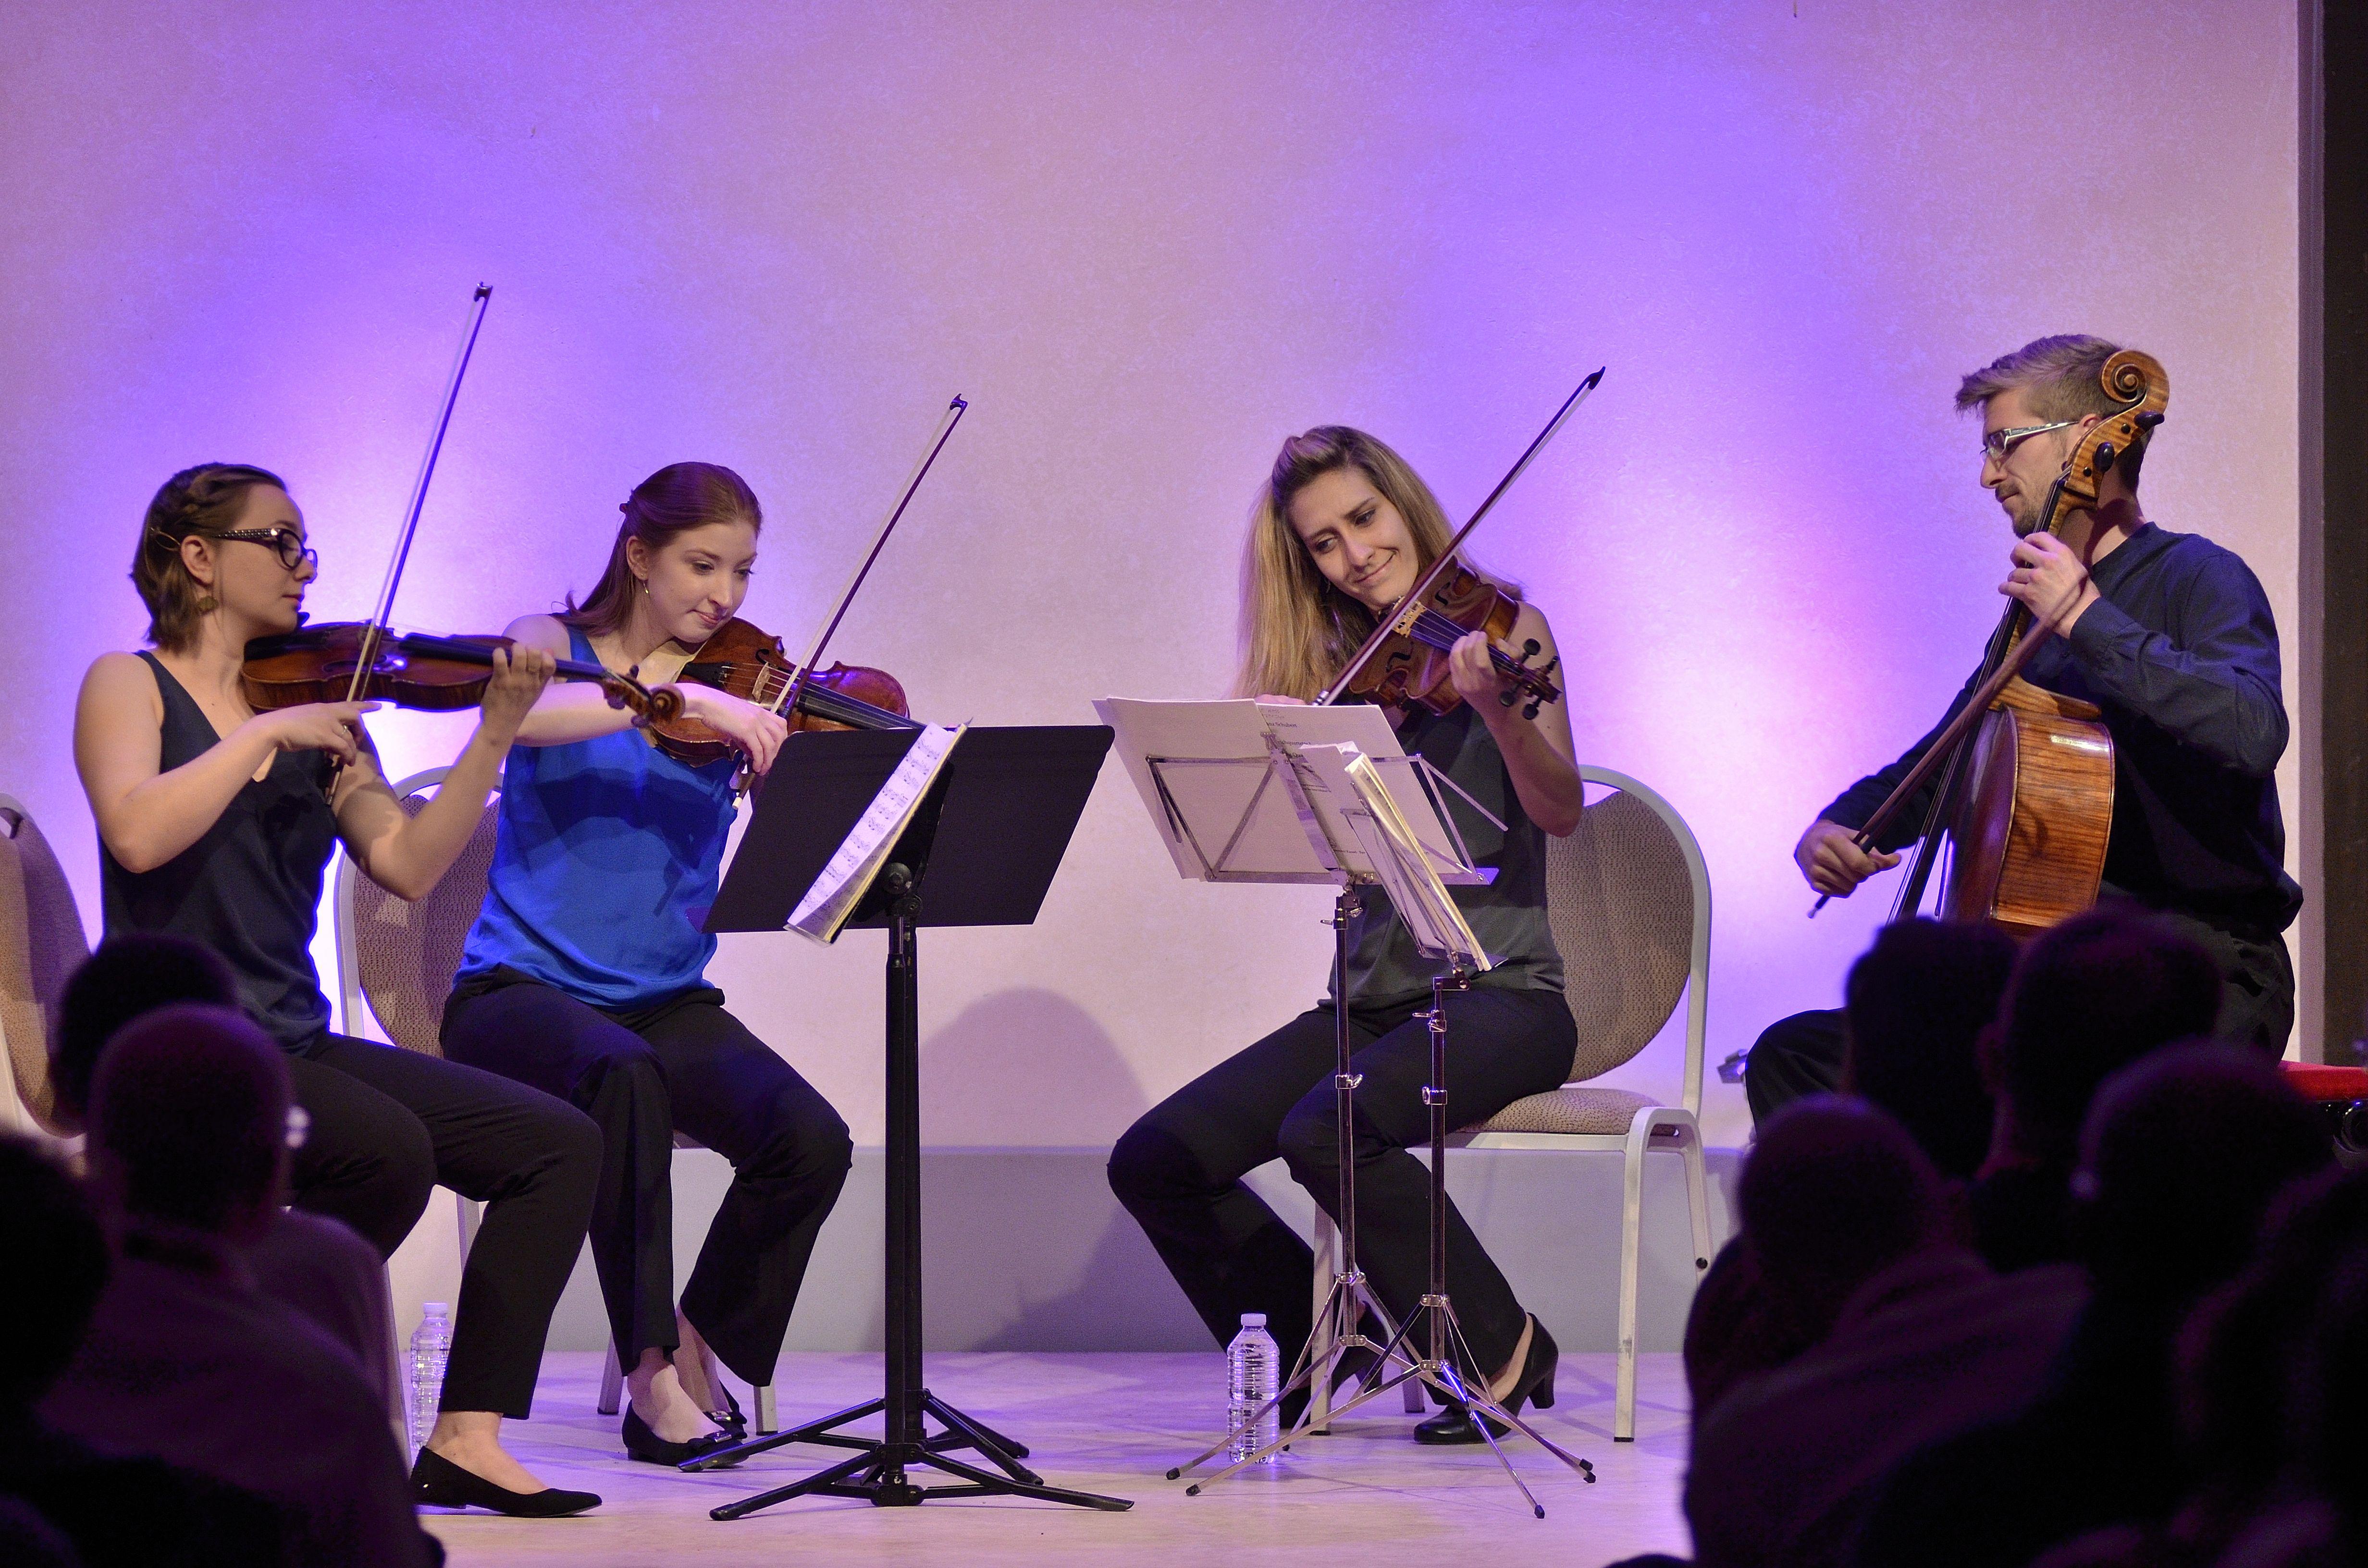 The Consone String Quartet in performance